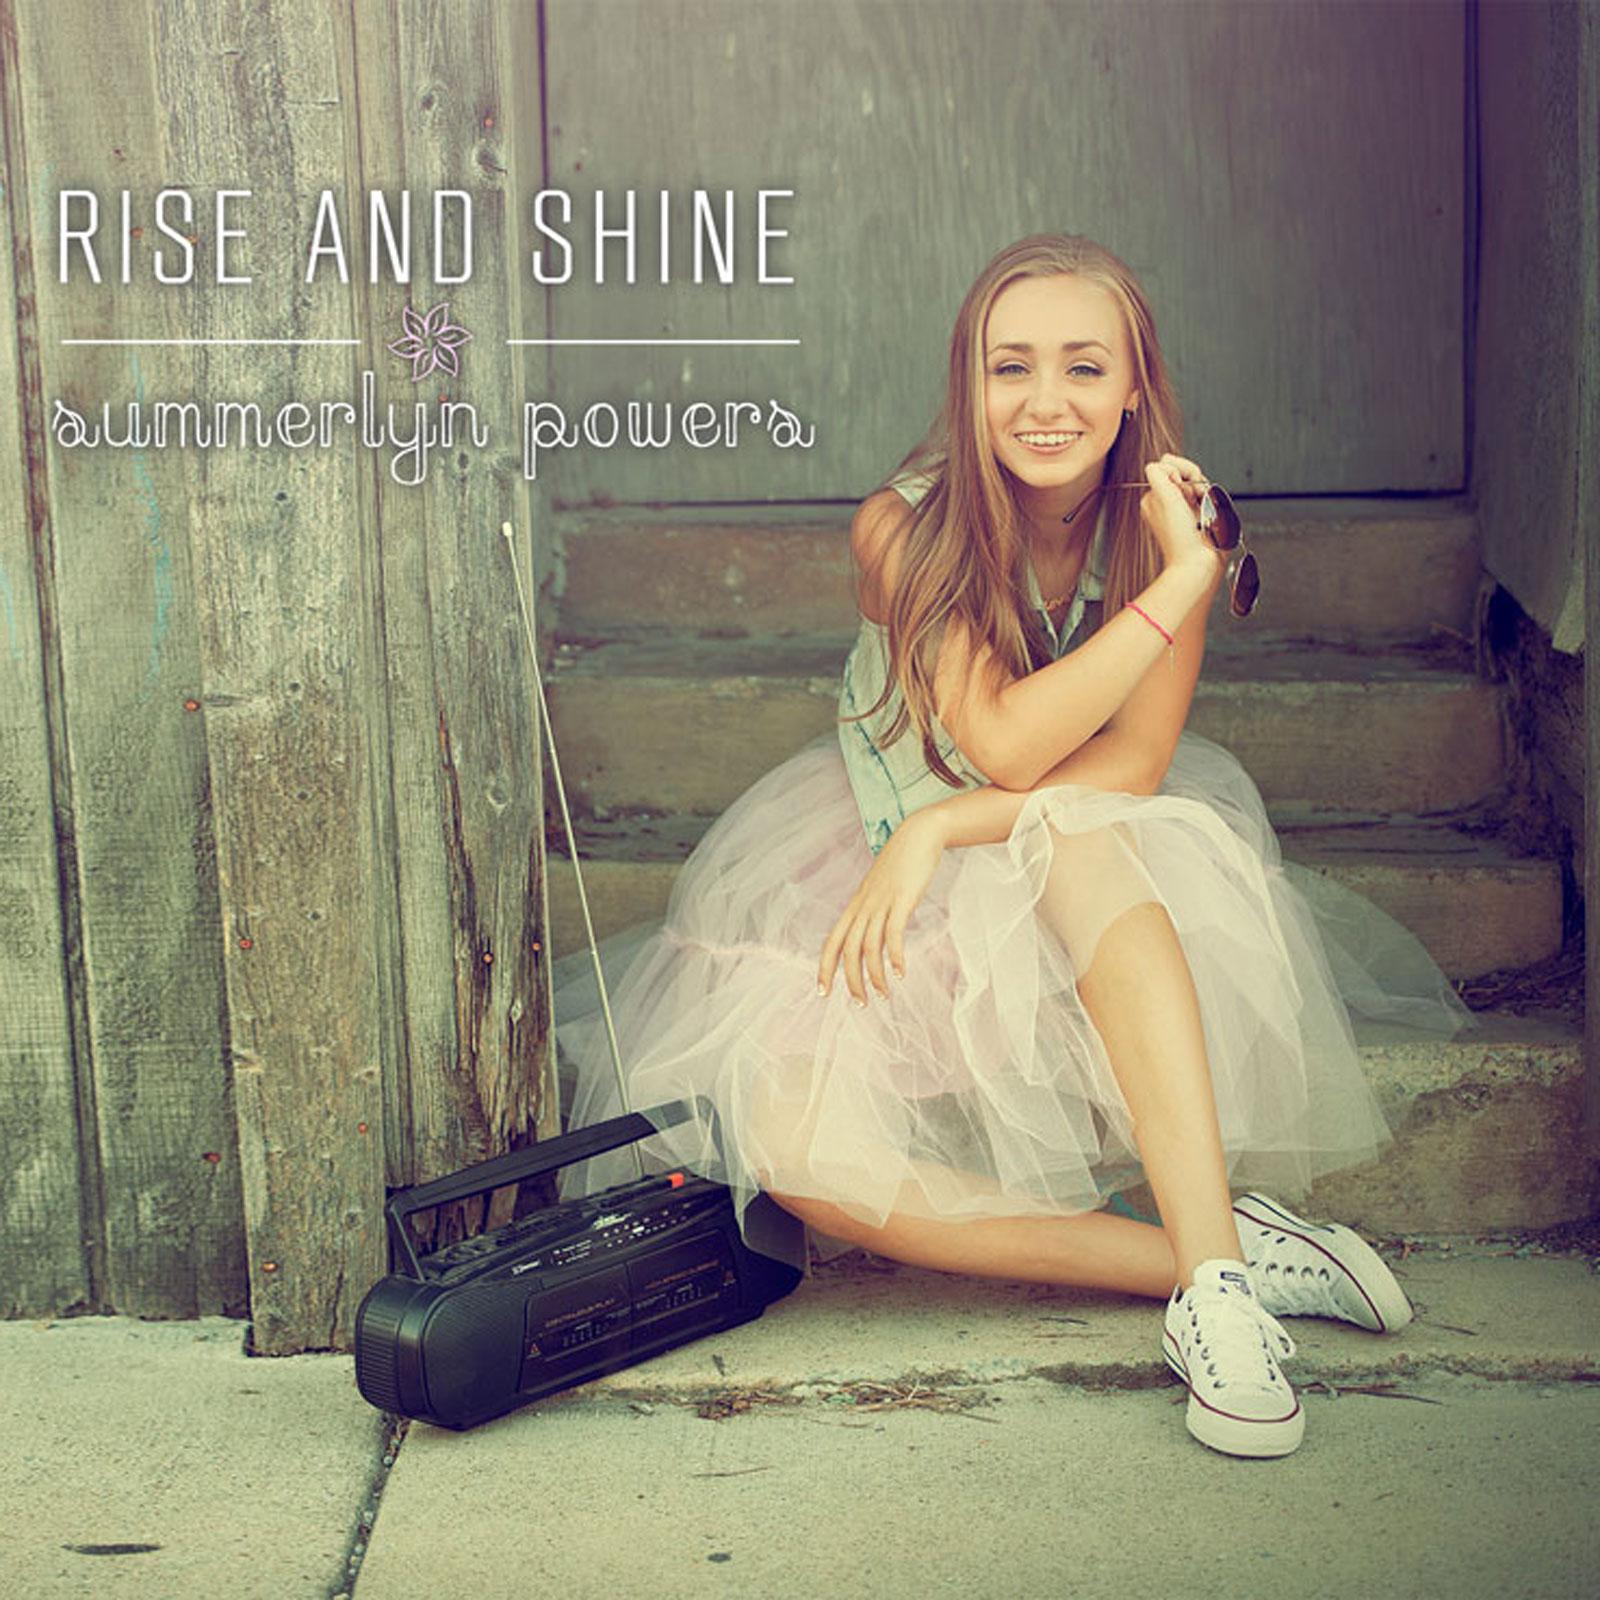 Summerlyn Powers, Rise & Shine